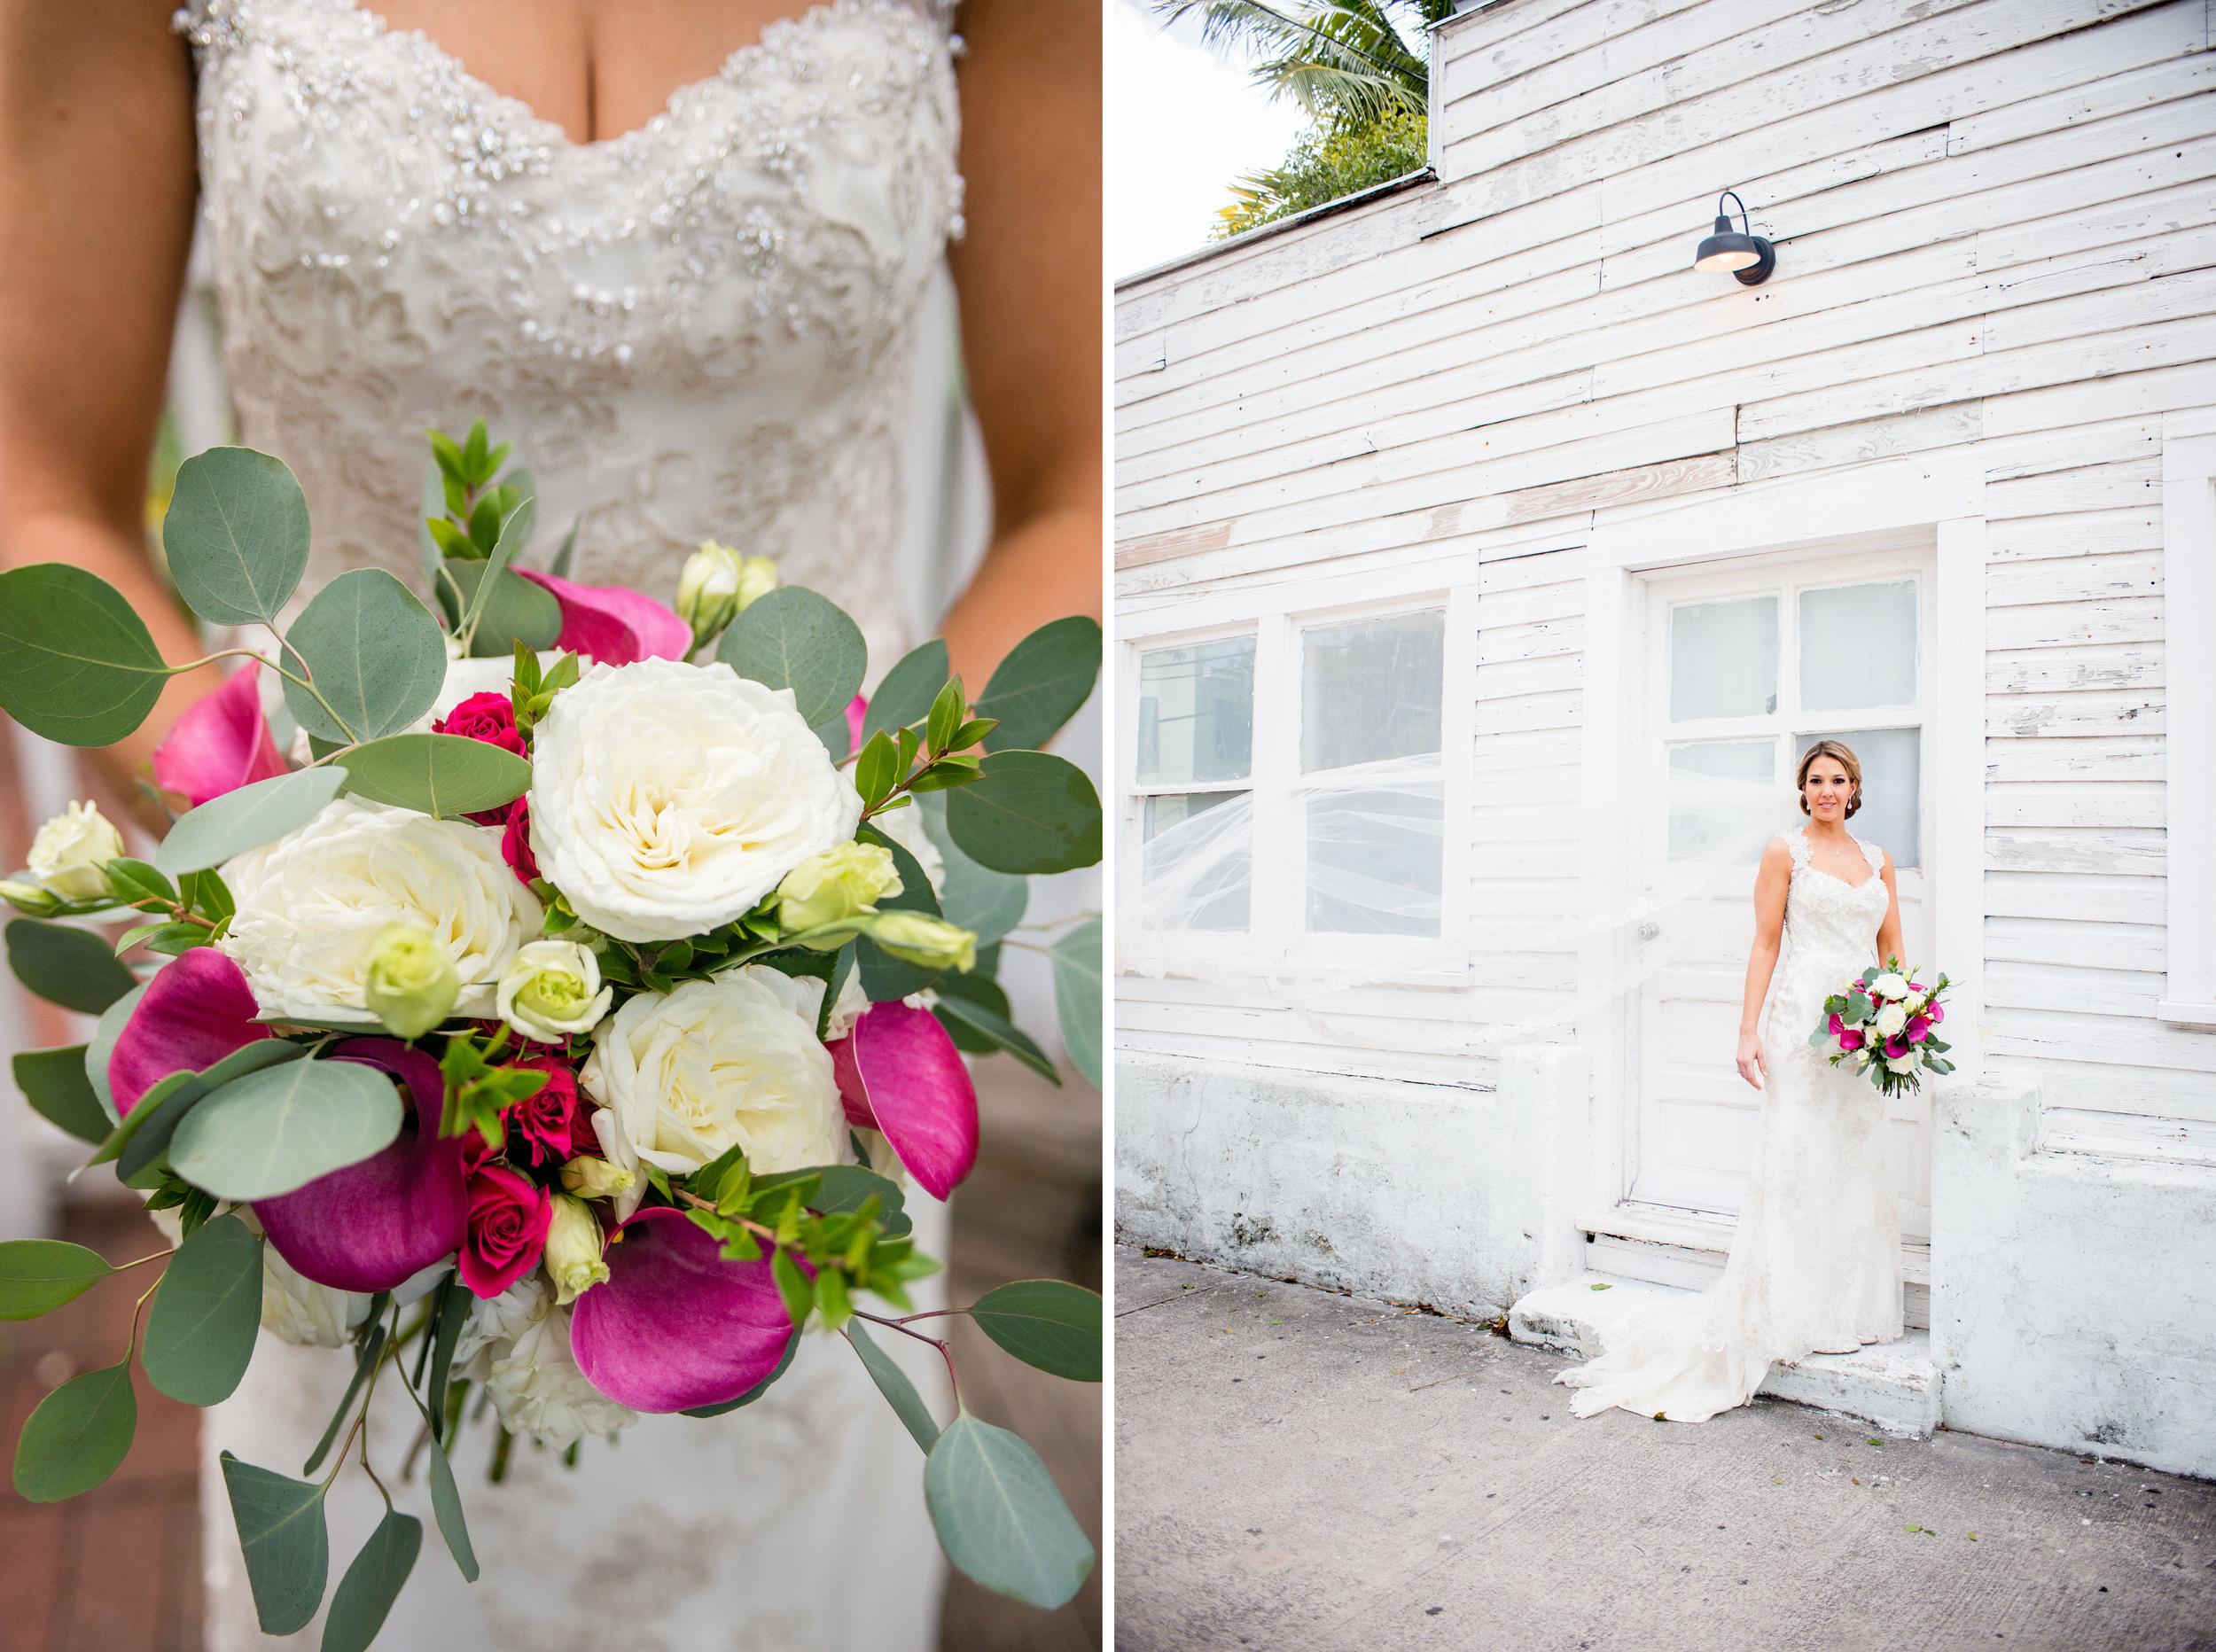 ocean-key-resort-key-west-wedding-014.jpg